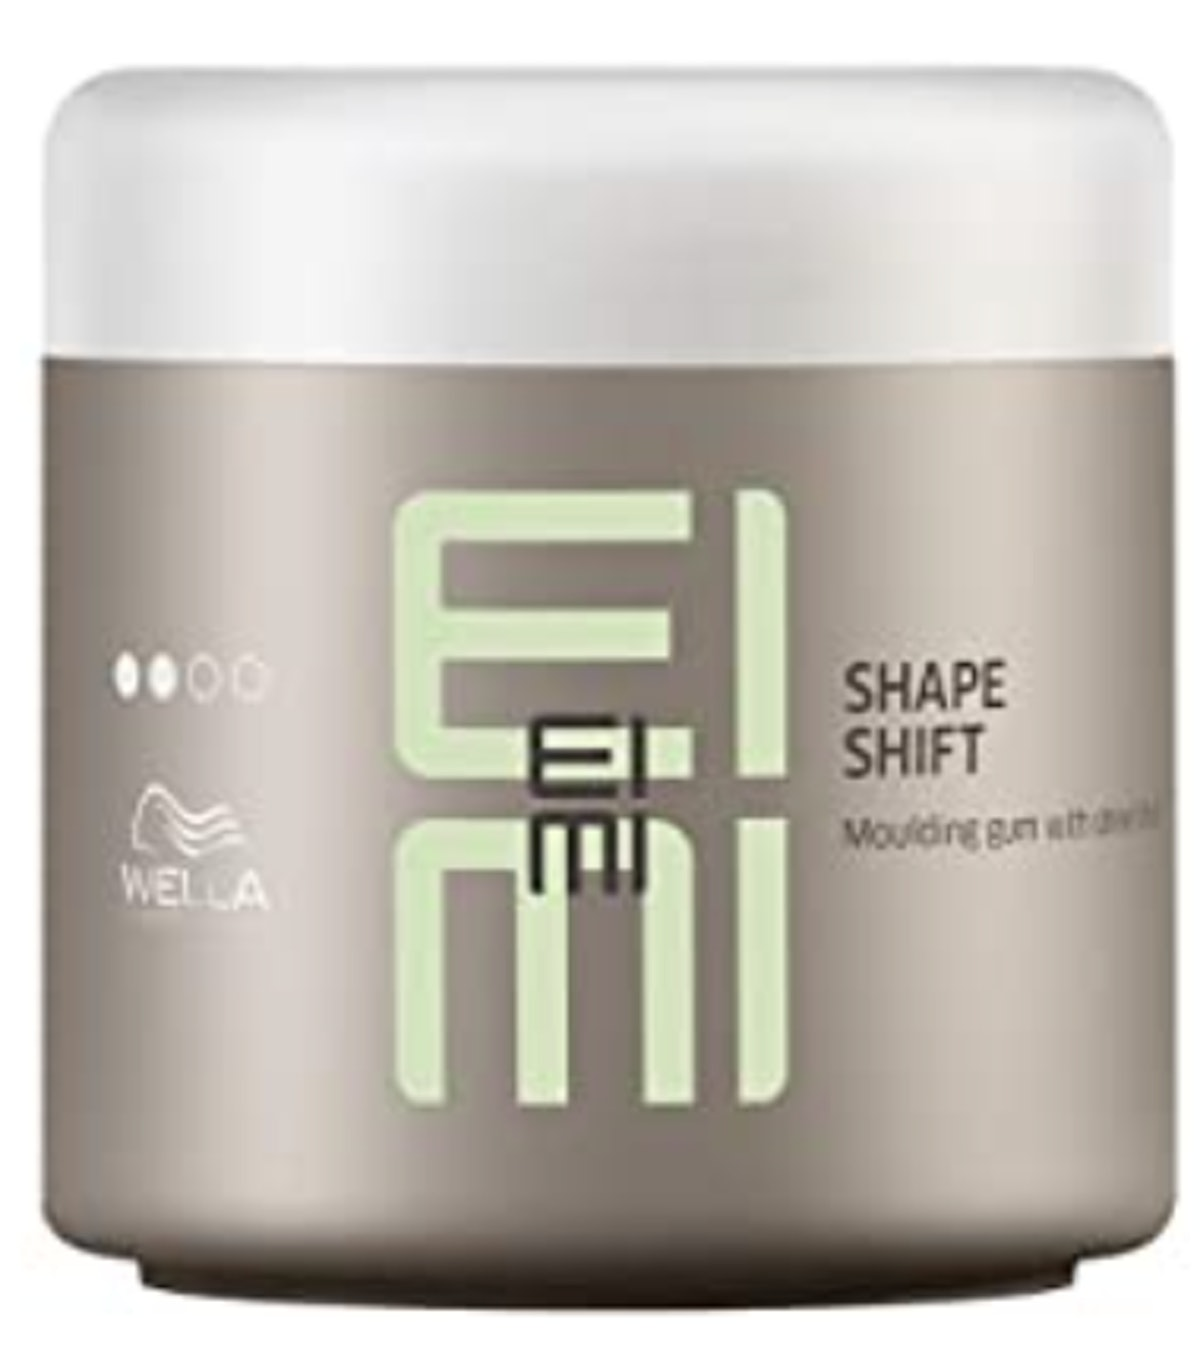 EIMI Shape Shift, Strong Hold Styling Paste, Molding Gum with Shine Finish